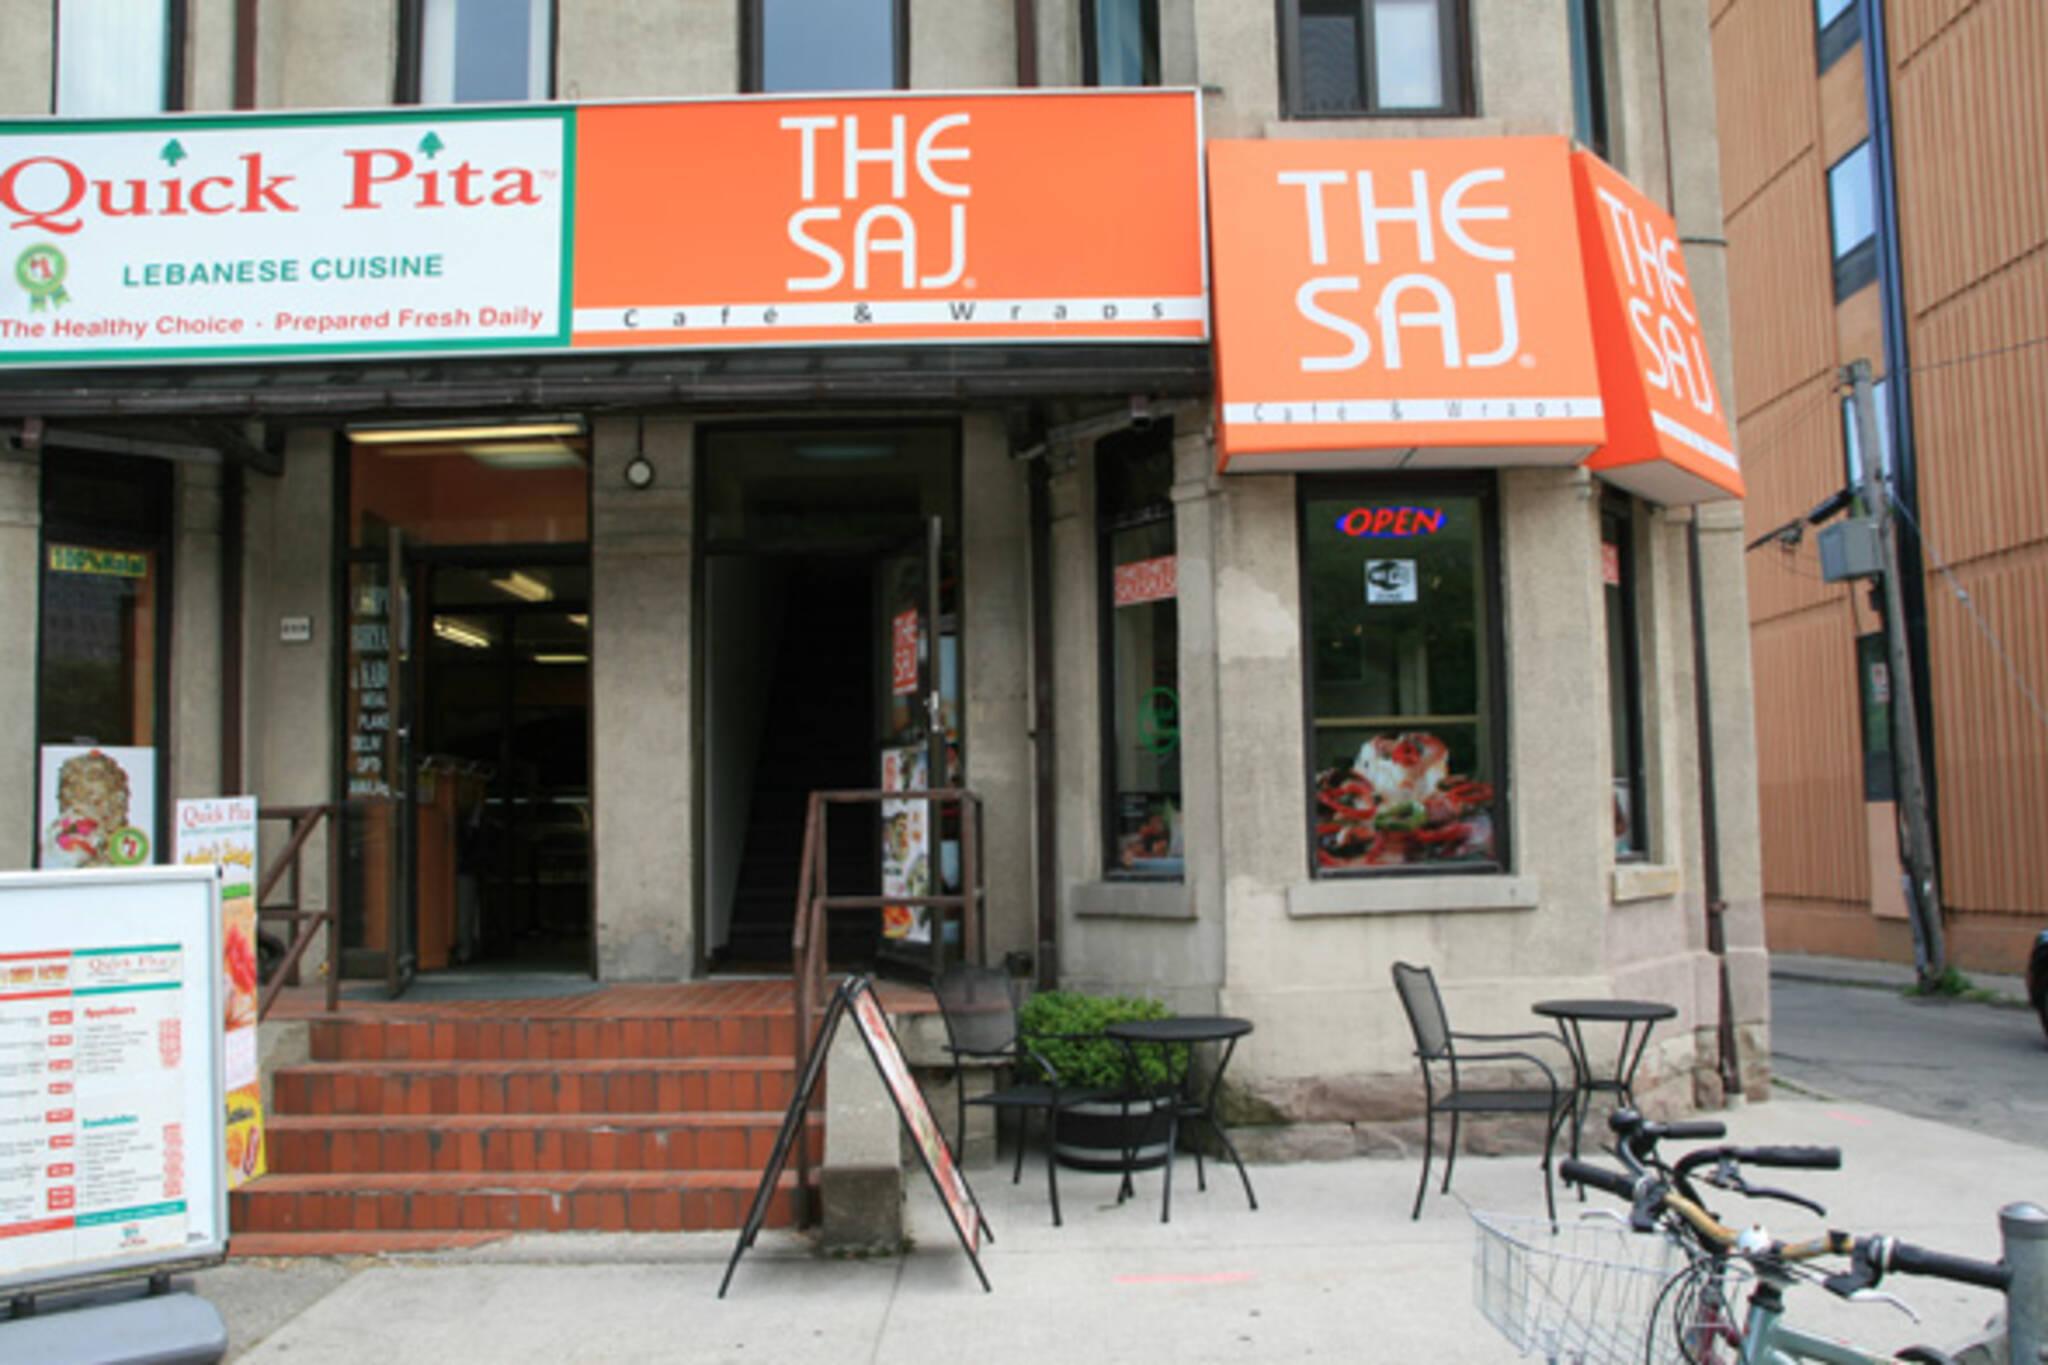 The Saj Toronto